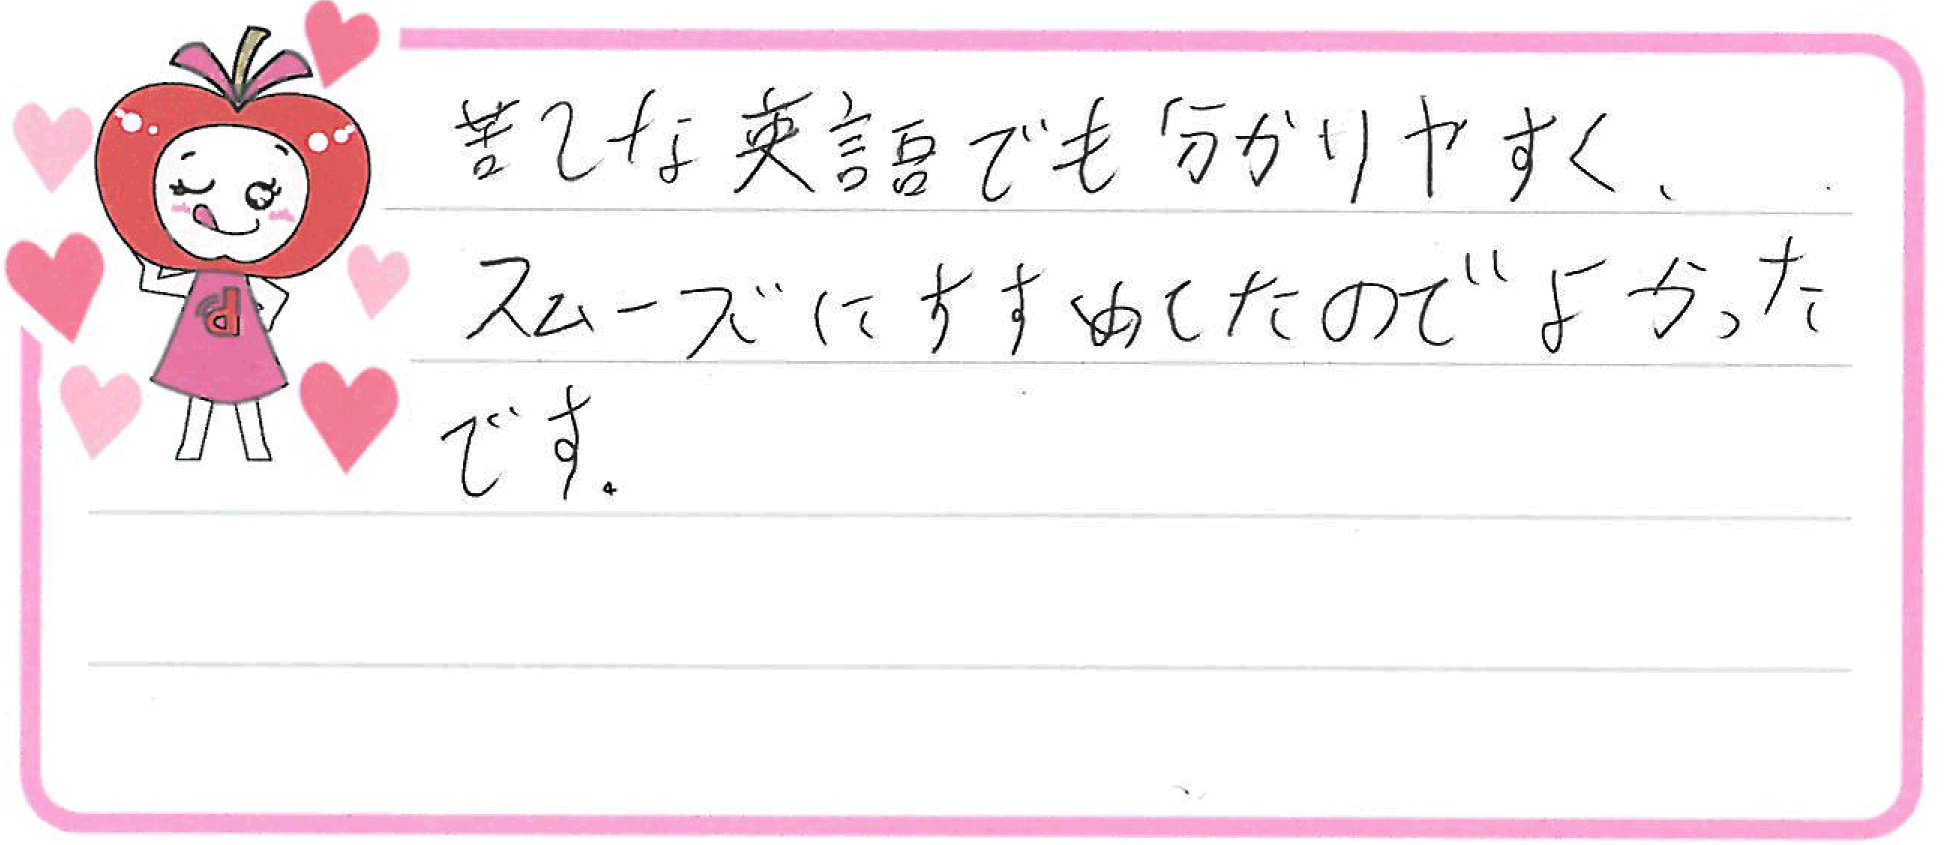 Y君(大飯郡高浜町)からの口コミ